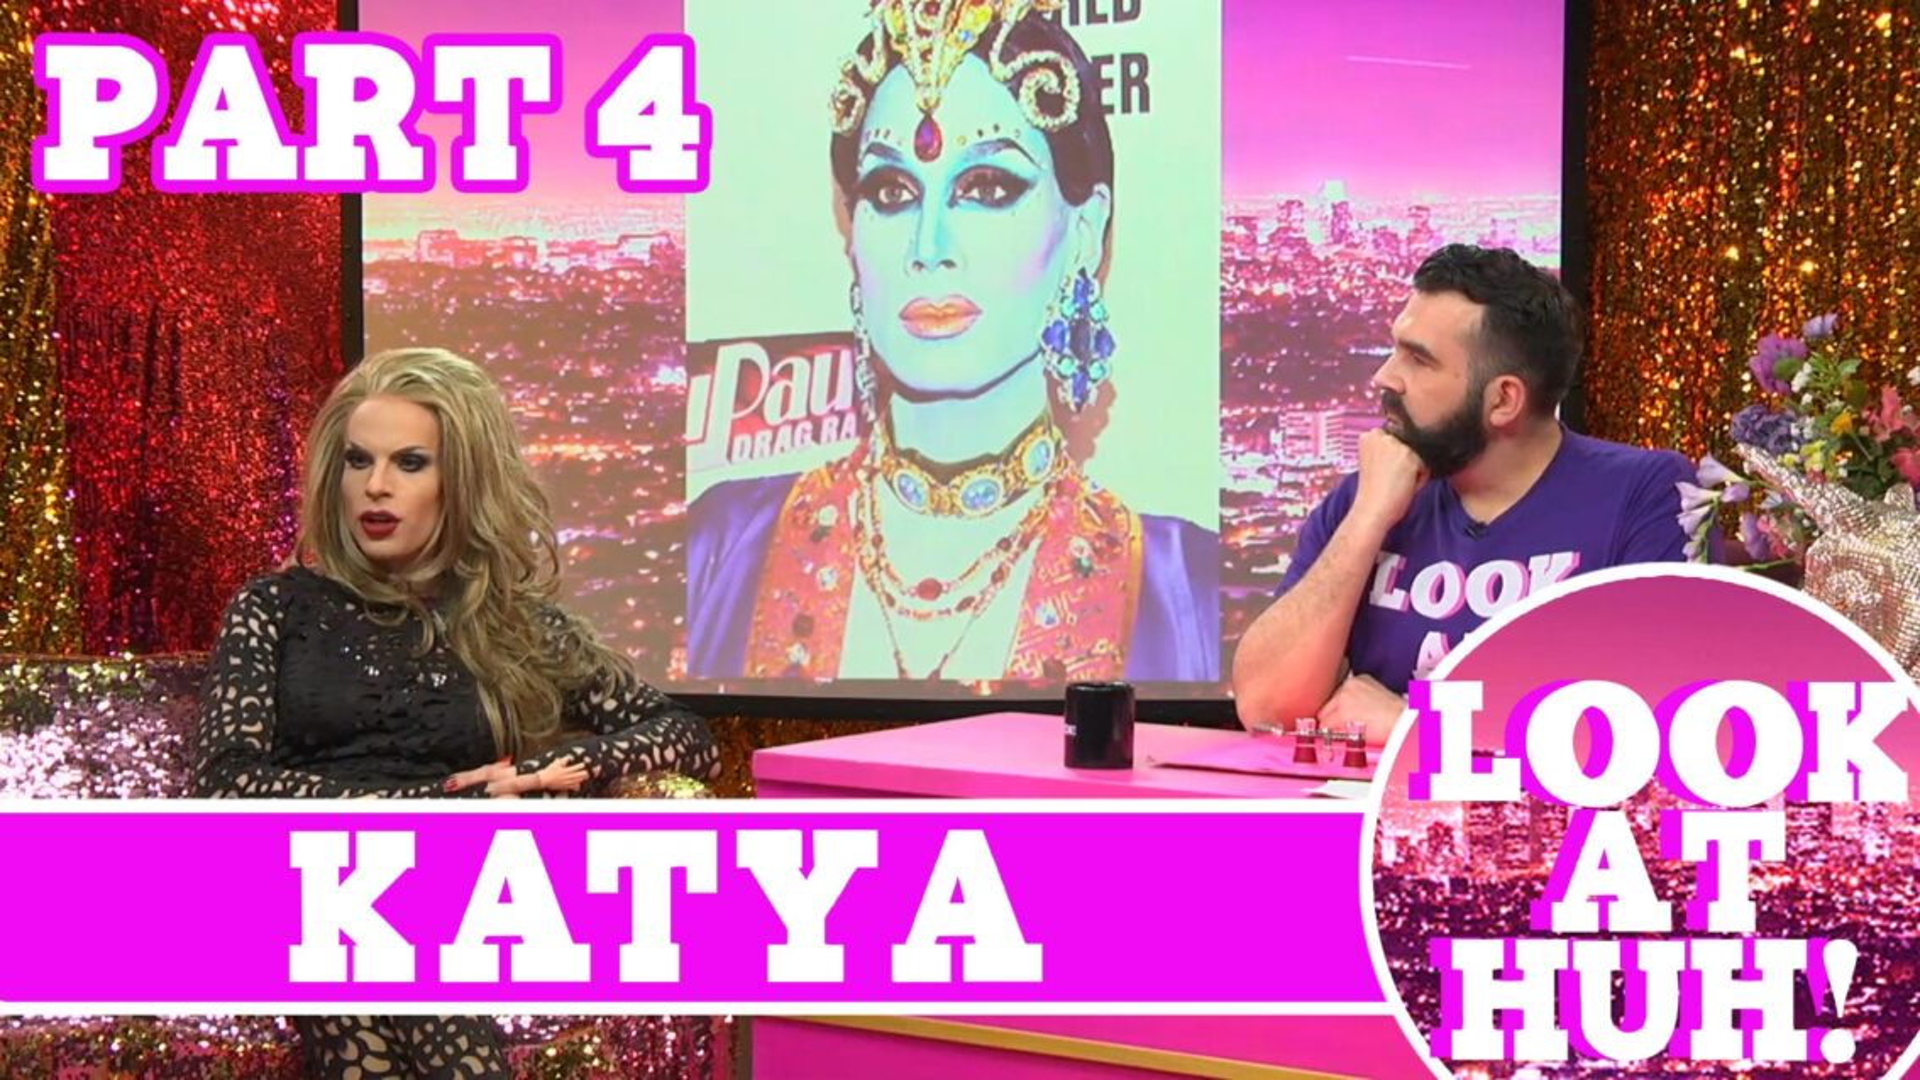 Katya on Hey Qween: Look at Huh SUPERSIZED Pt 4